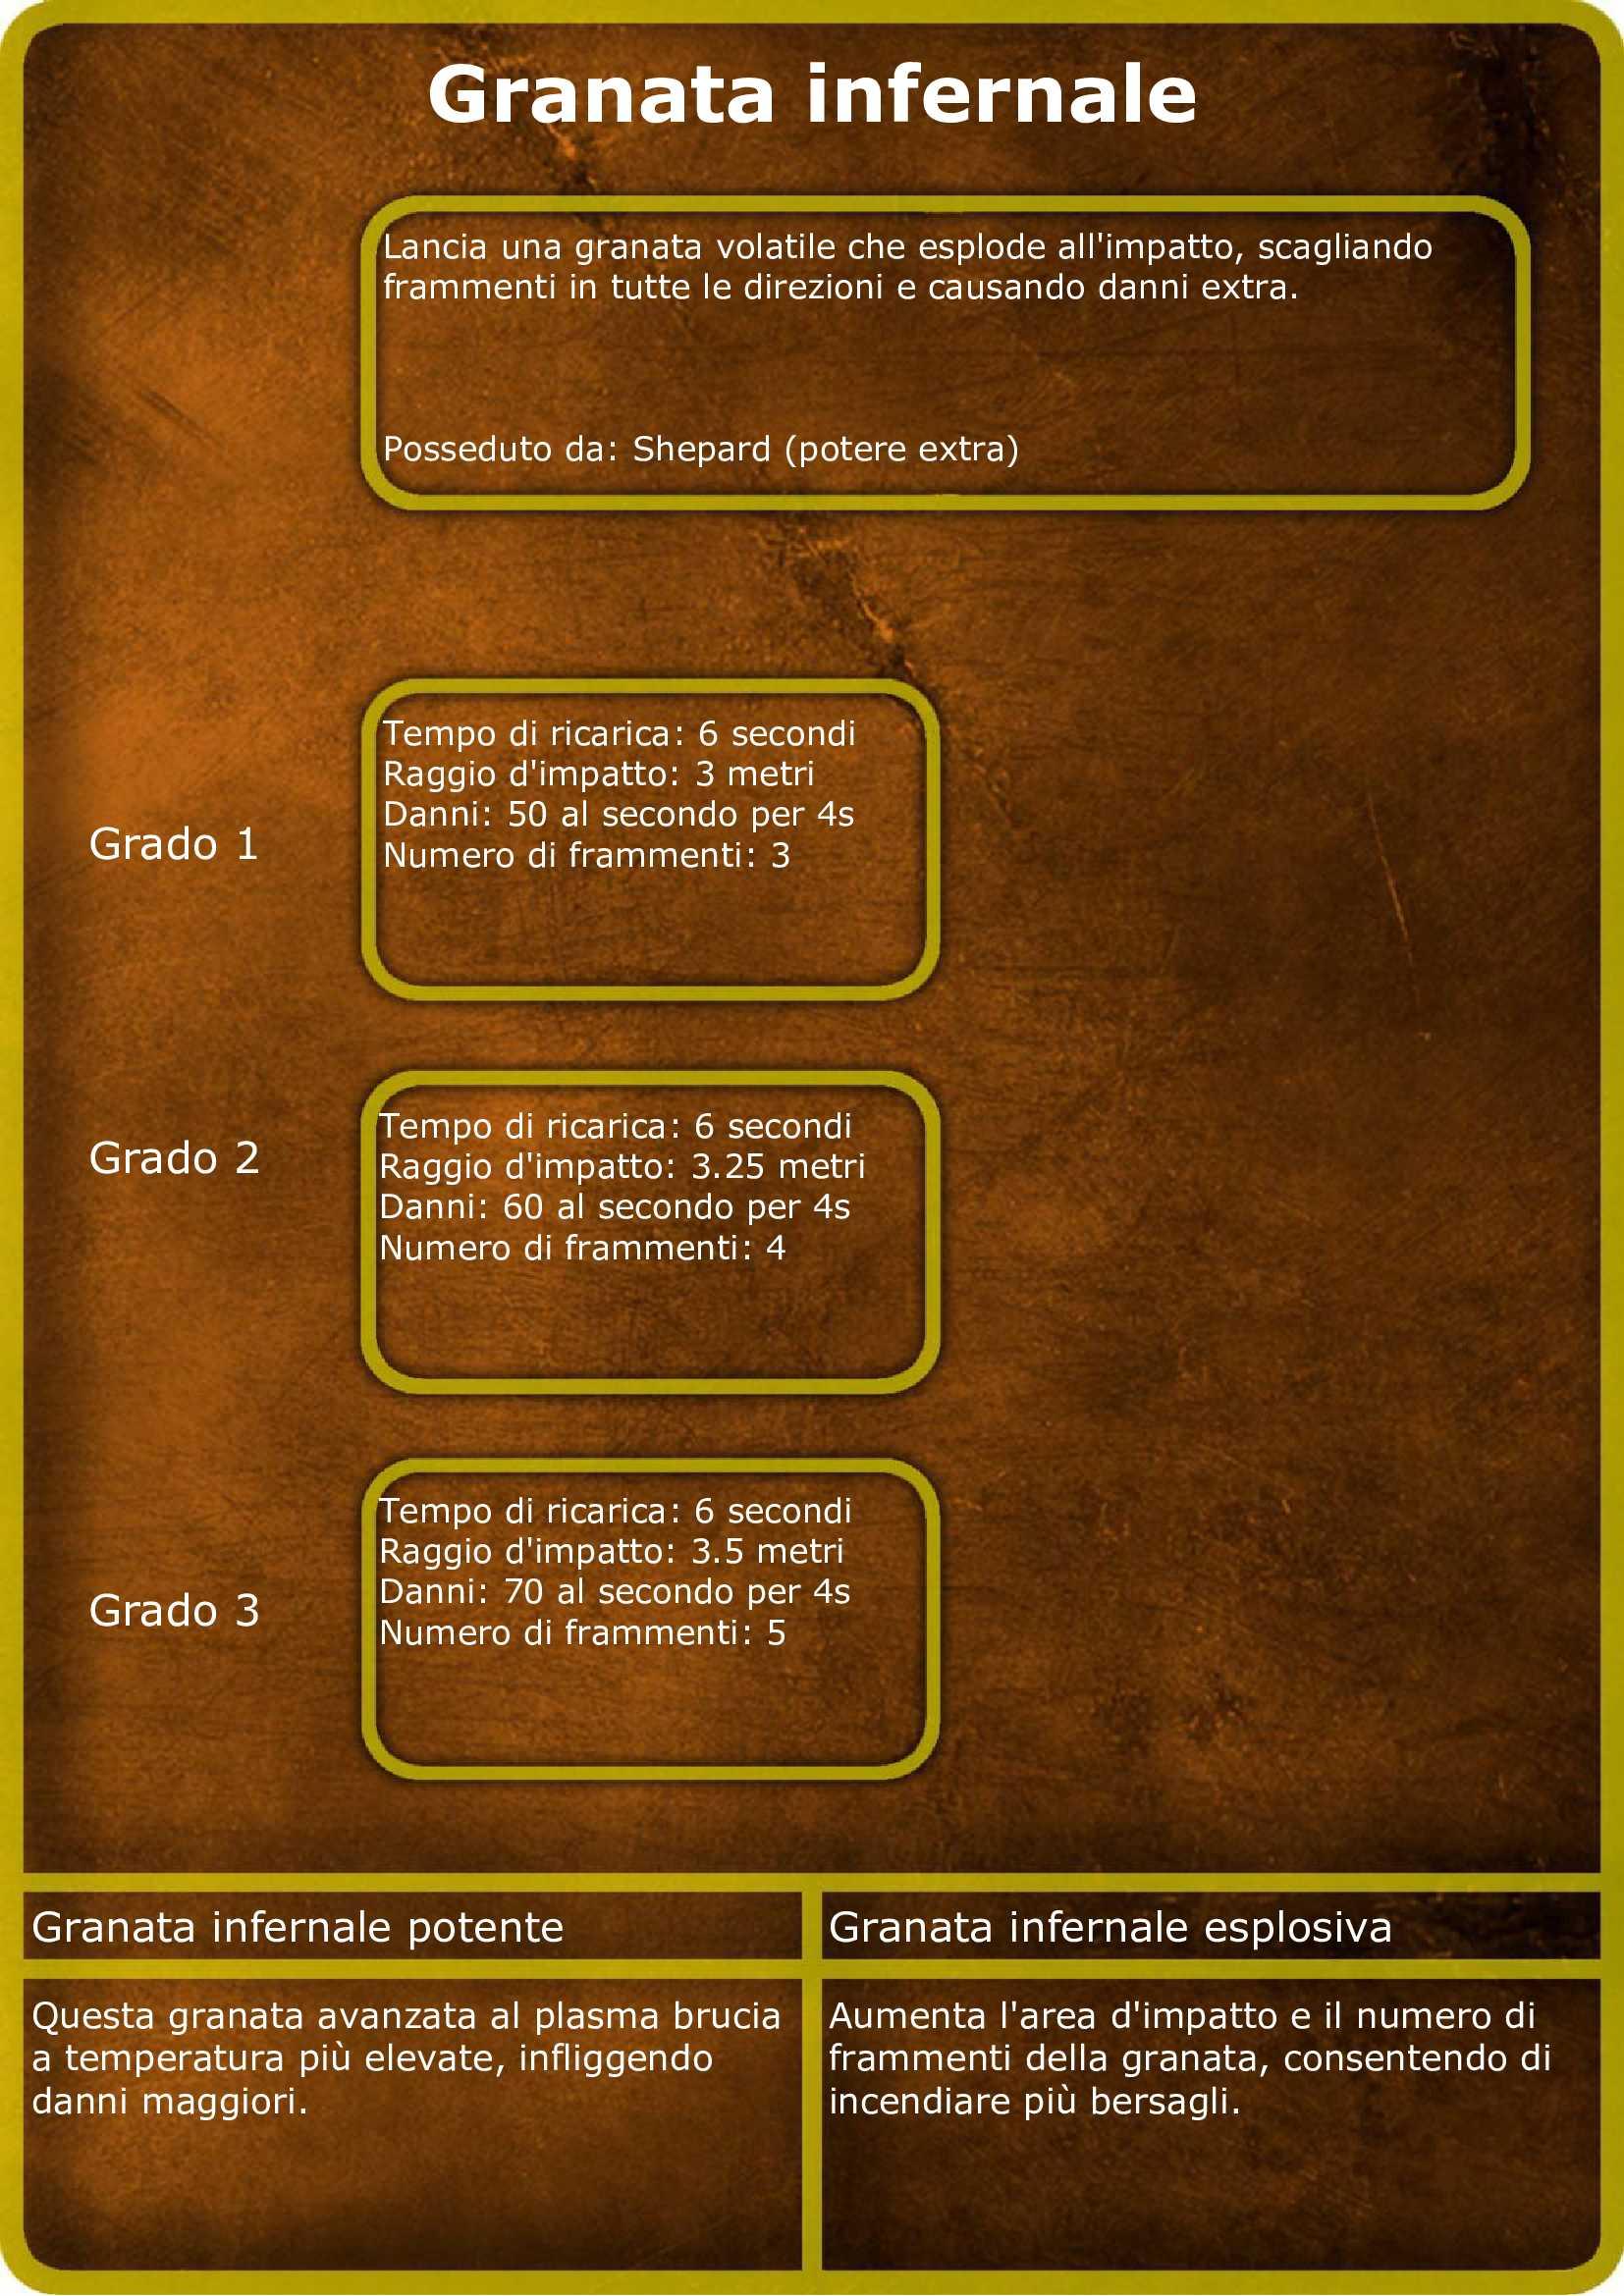 Granata infernale (Shepard)